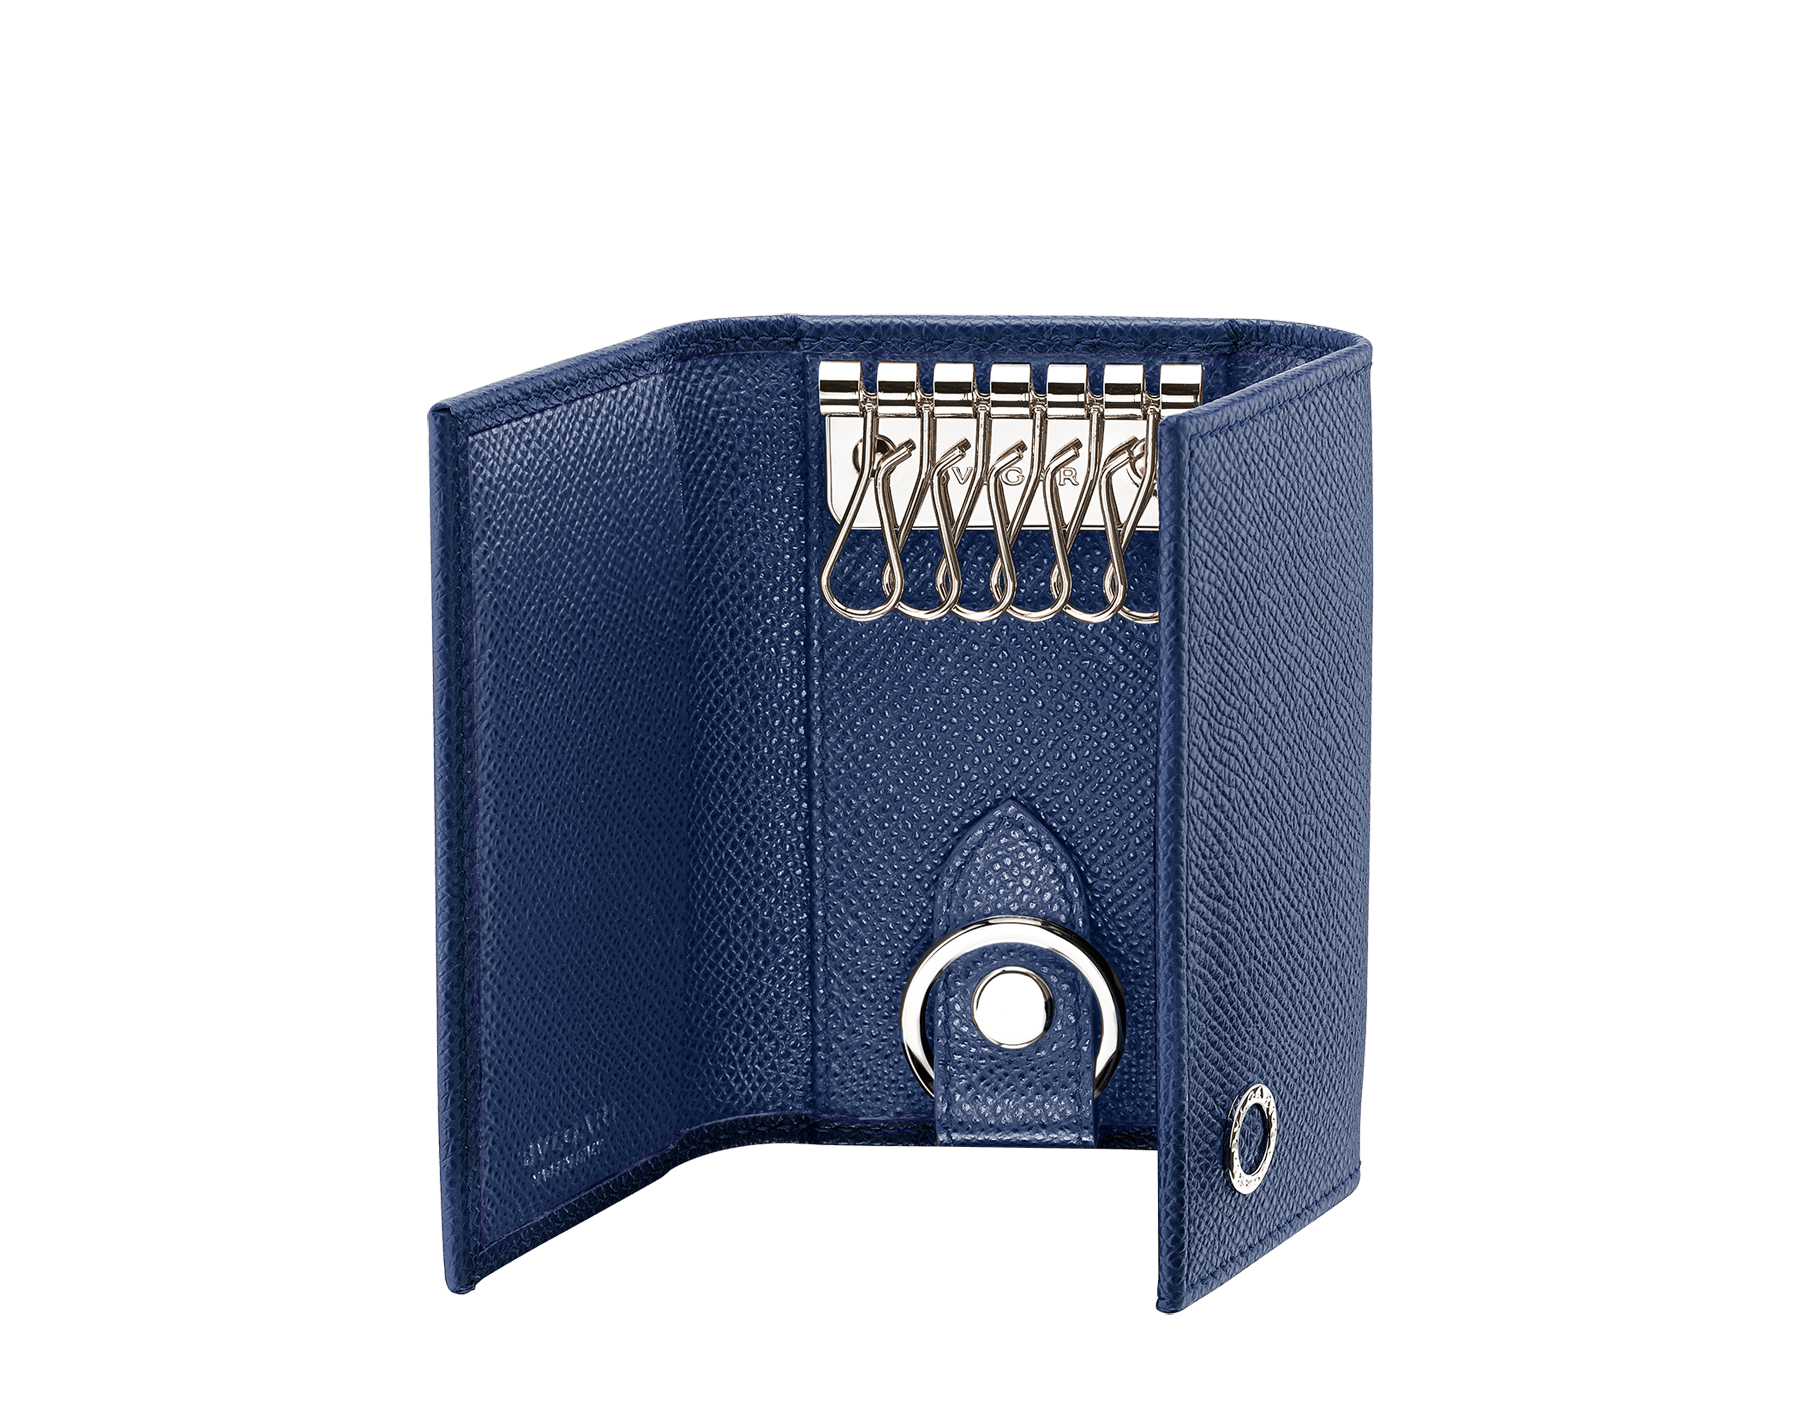 BVLGARI BVLGARI 兩用鑰匙包,採用 Pluto Stone 灰色珠面小牛皮和 Denim Sapphire 藍色珠面小牛皮。附可拆式鍍鈀黃銅汽車鑰匙扣。 BBM-DOUBLE-KEYHOLDa image 2